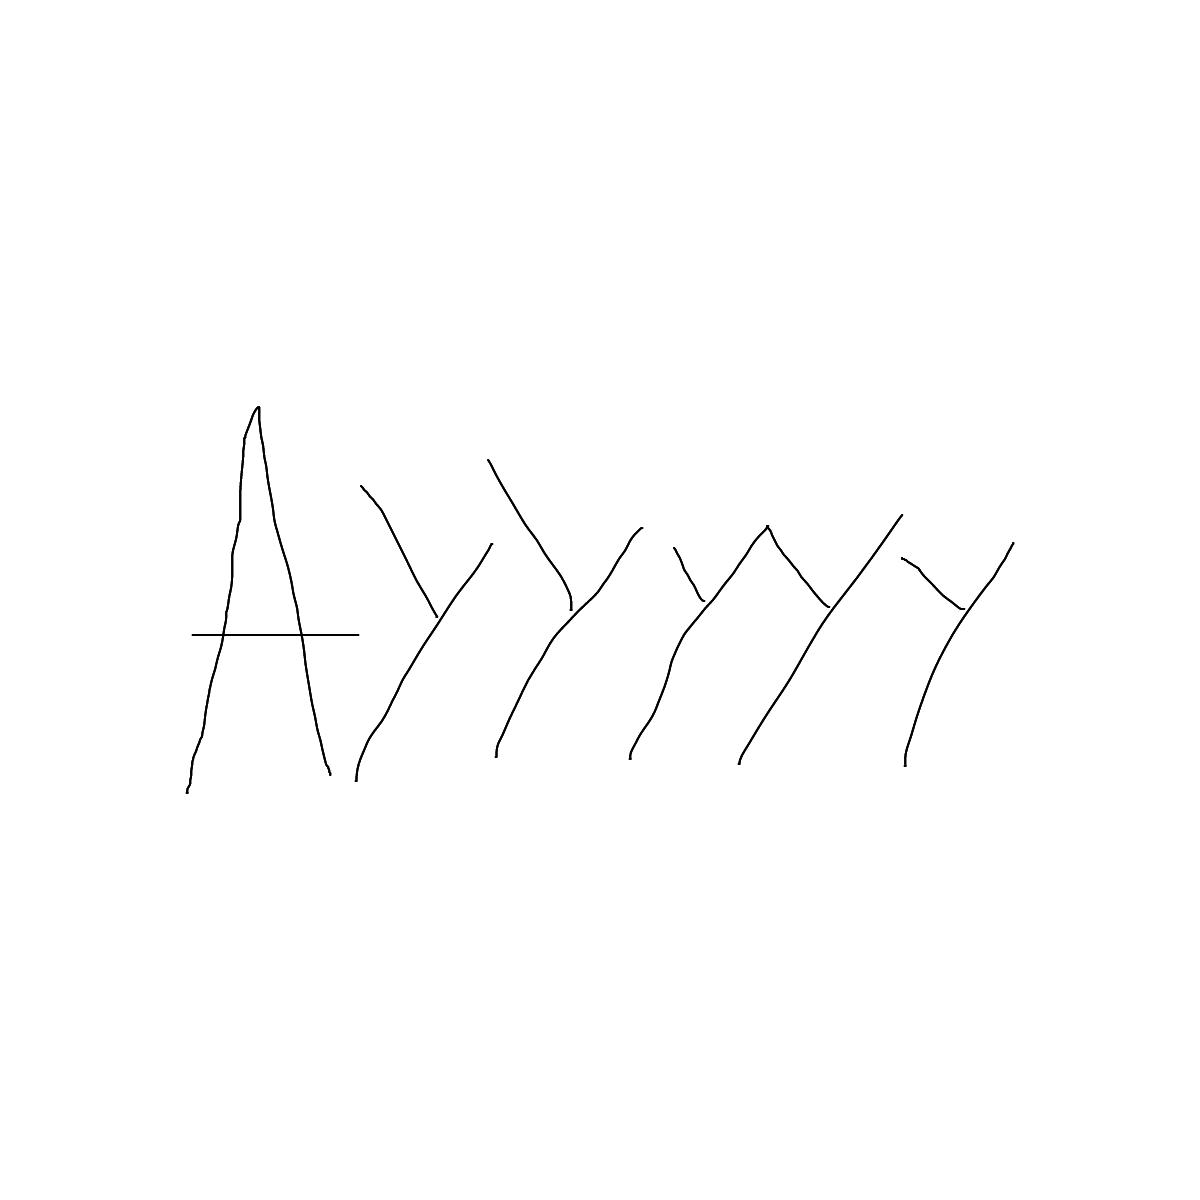 BAAAM drawing#11209 lat:59.9187698364257800lng: 10.7524986267089840